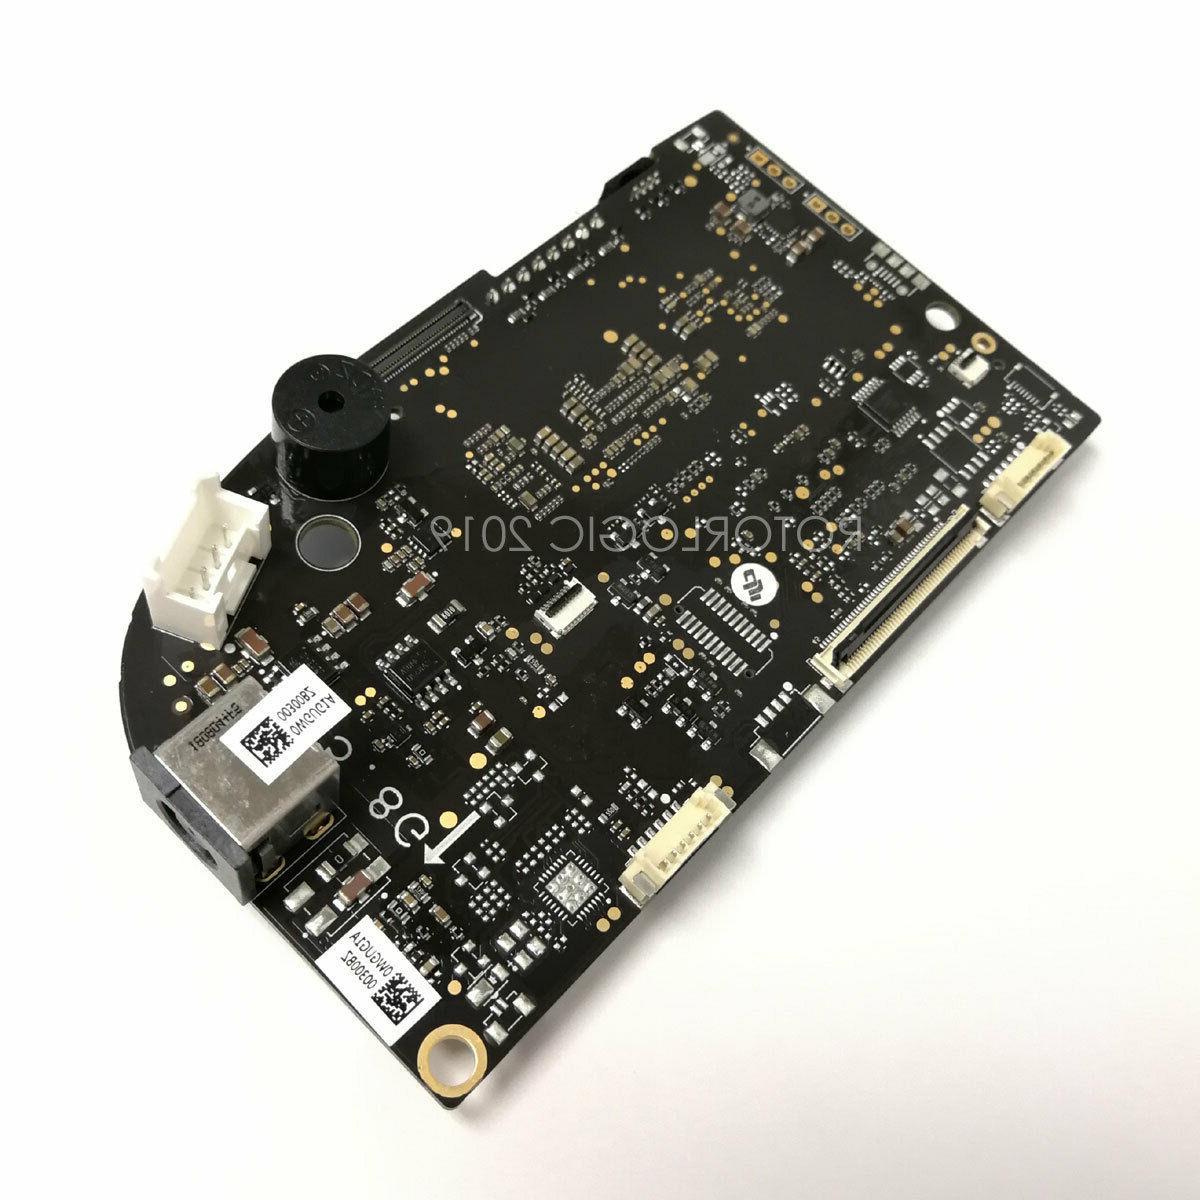 DJI Phantom Pro V2.0 Controller Part Main -Brand